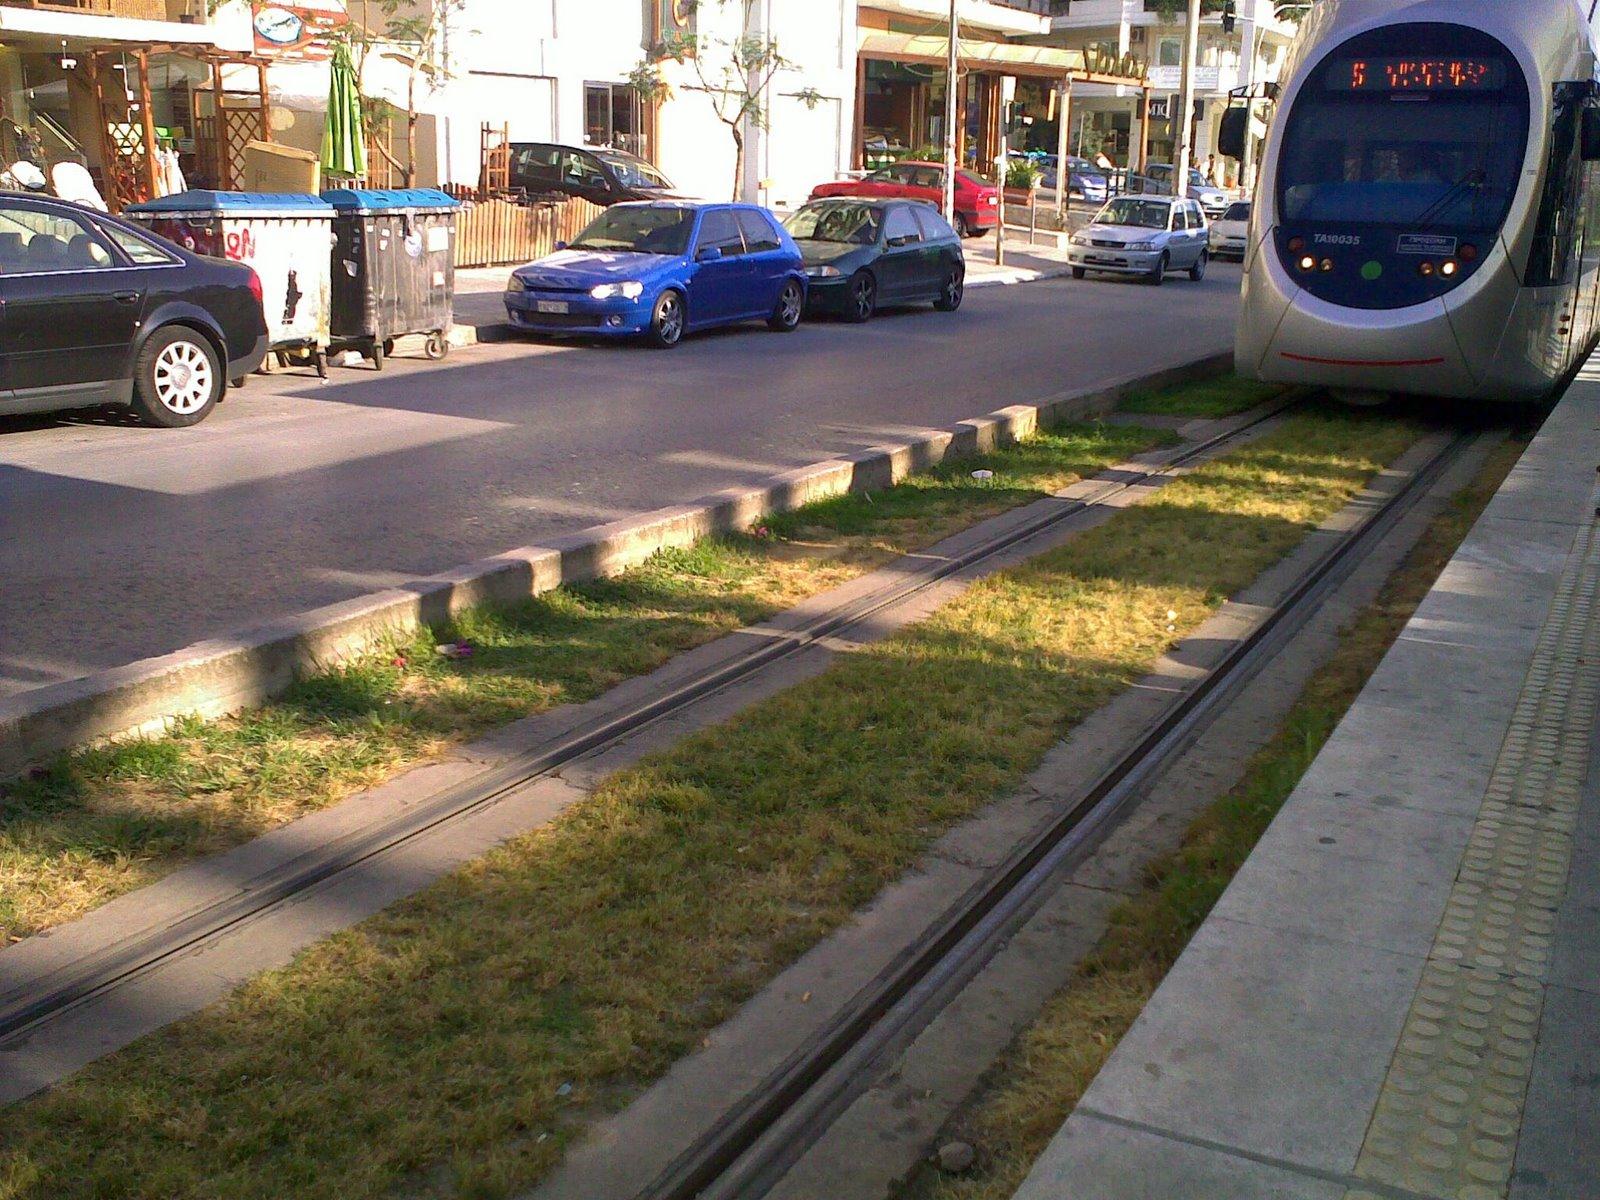 tram-athens-01.jpg